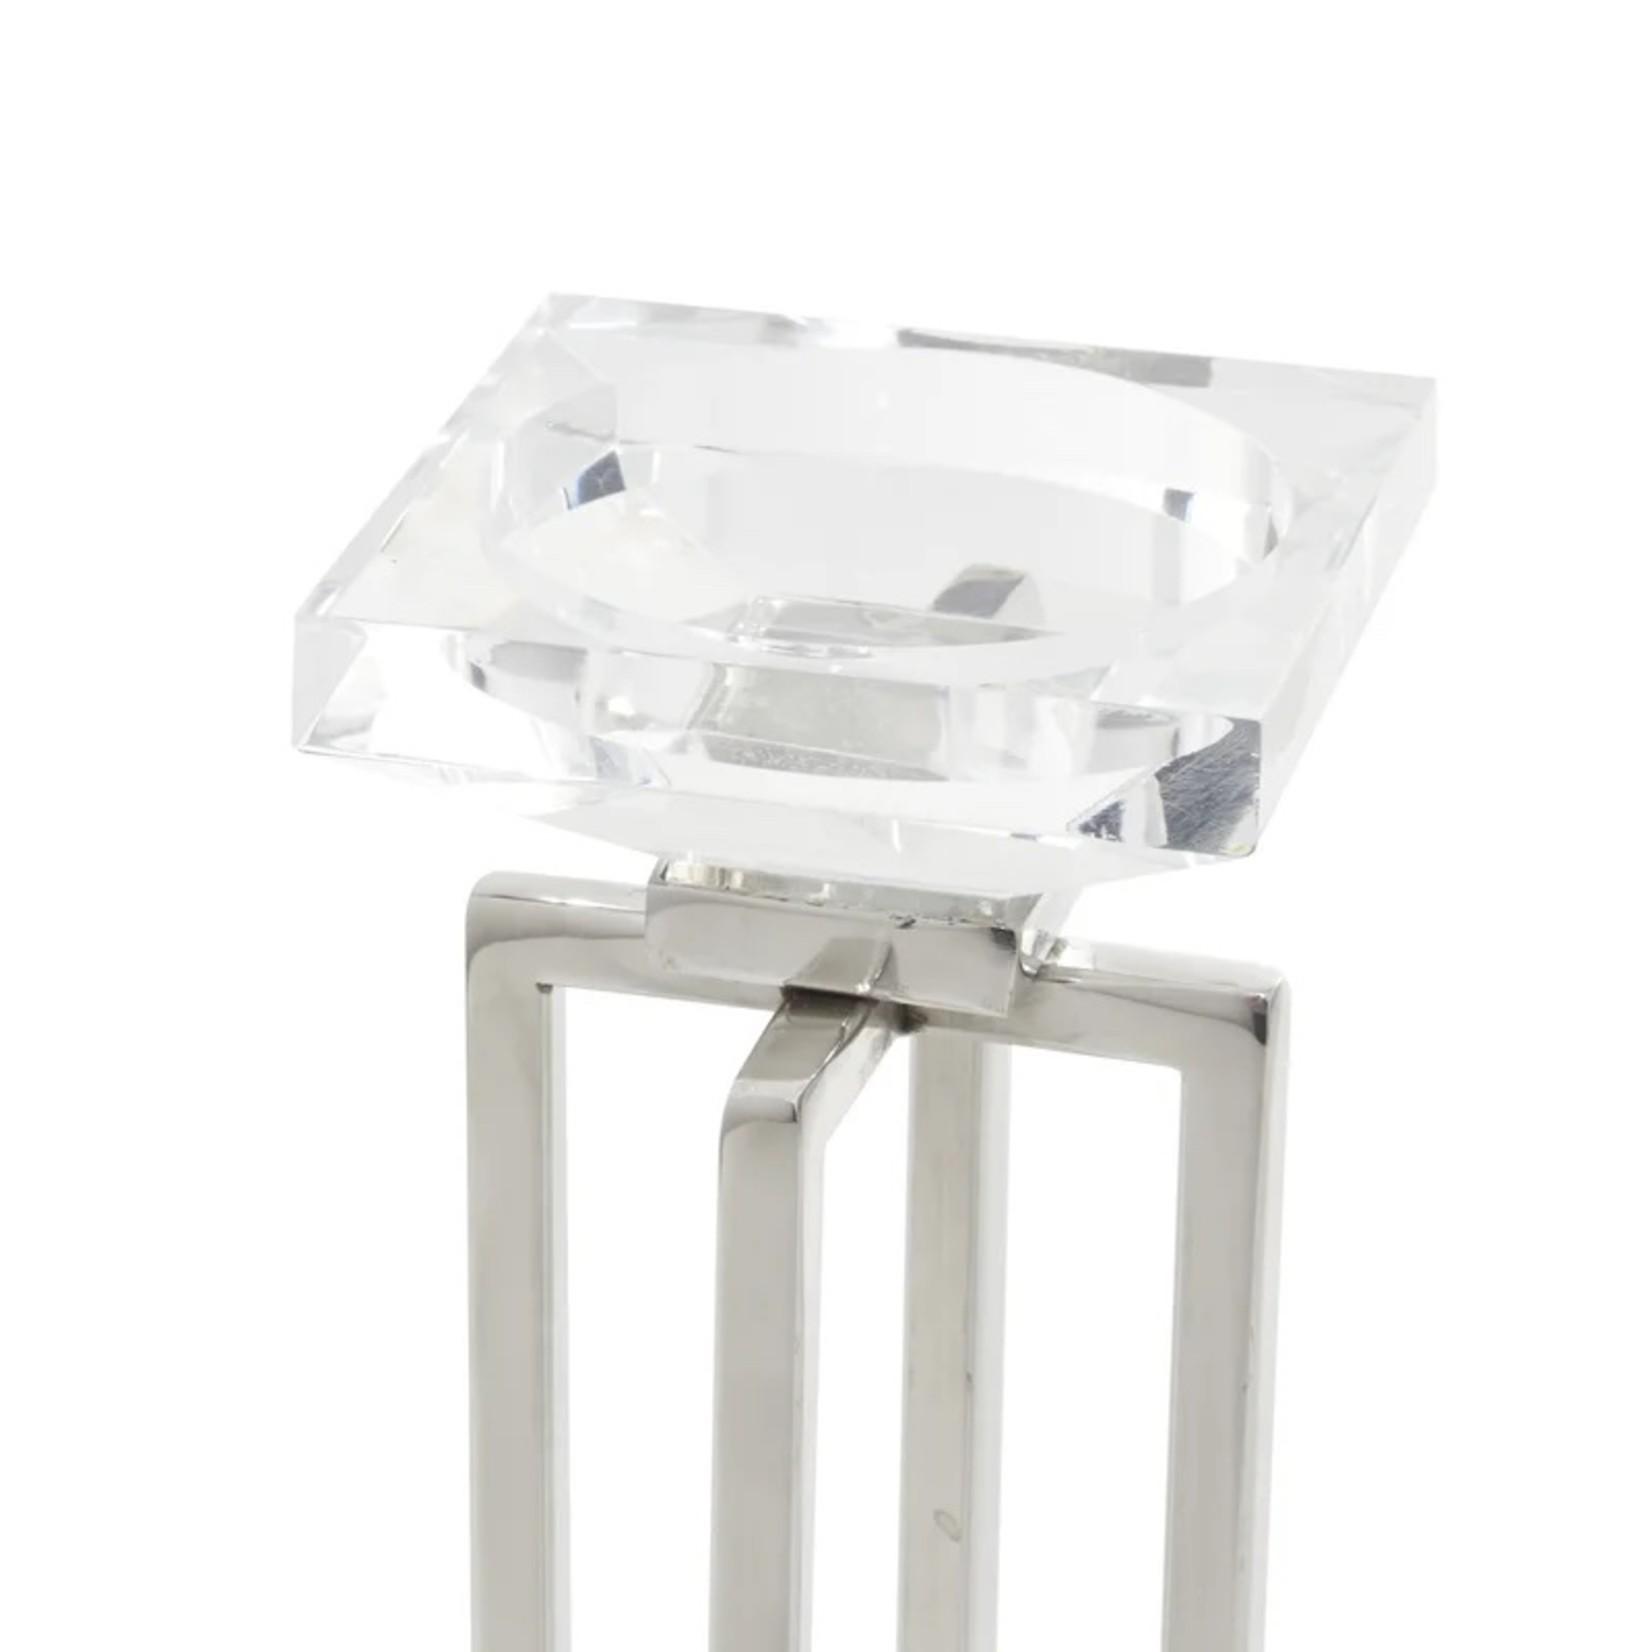 *2 Piece Stainless Steel Tabletop Votive Holder Set